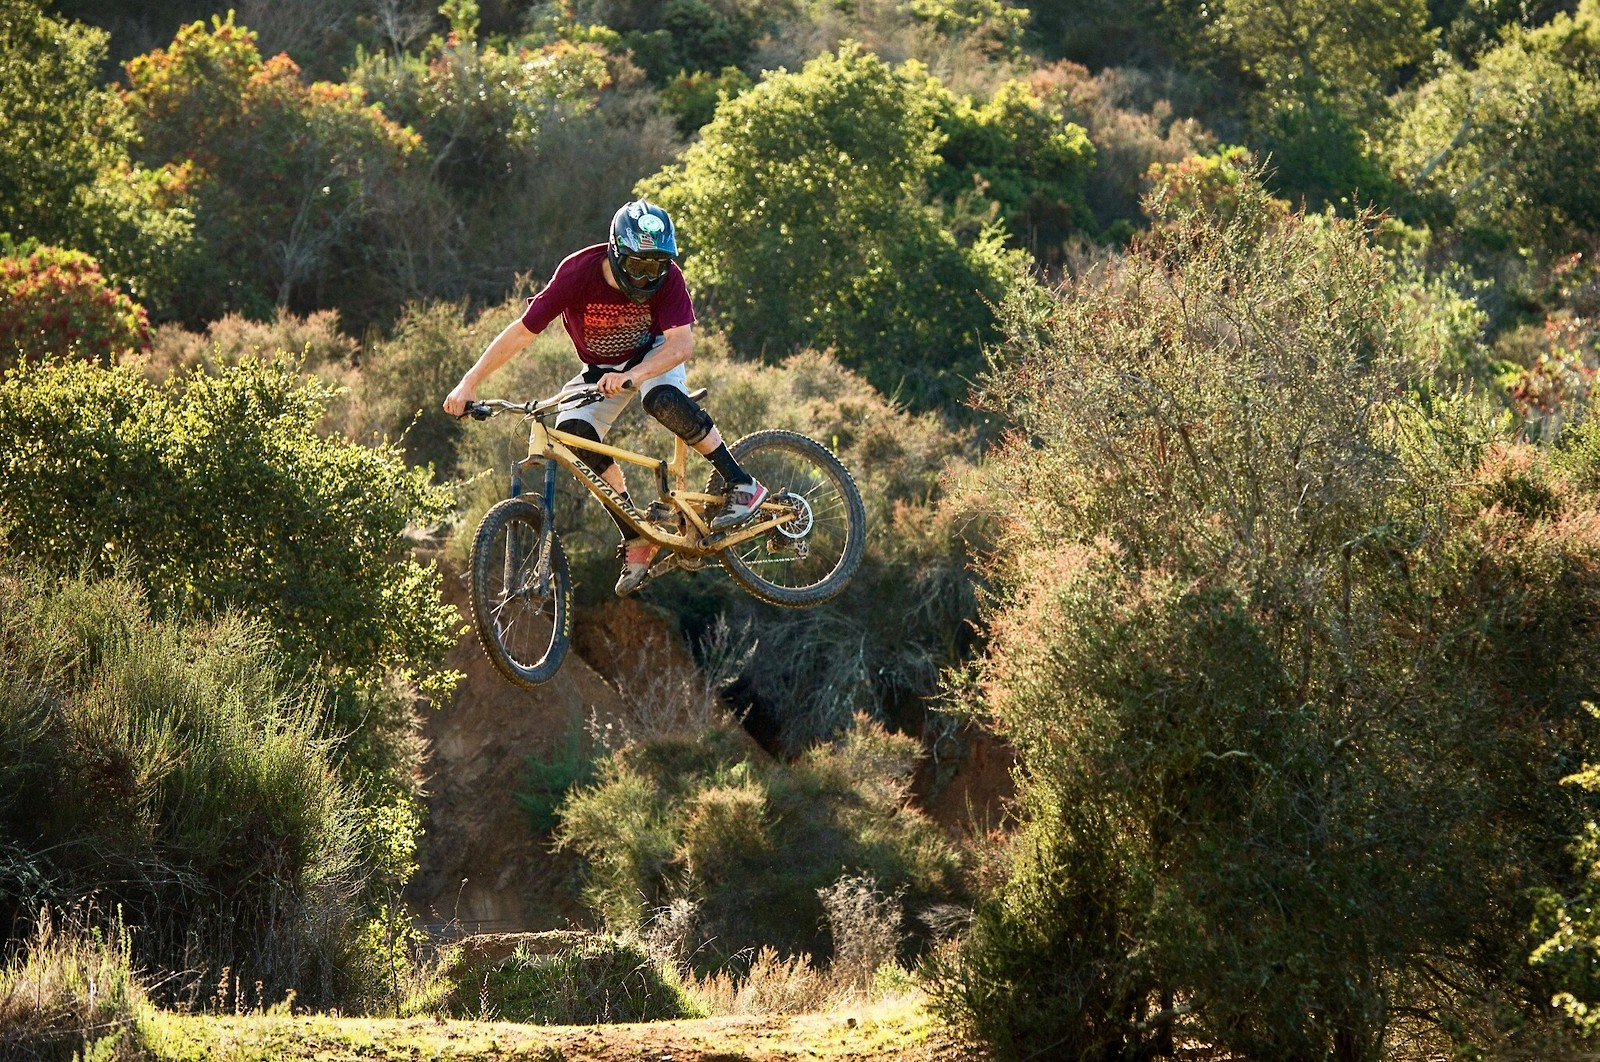 Sideways  - Scharney127 - Mountain Biking Pictures - Vital MTB